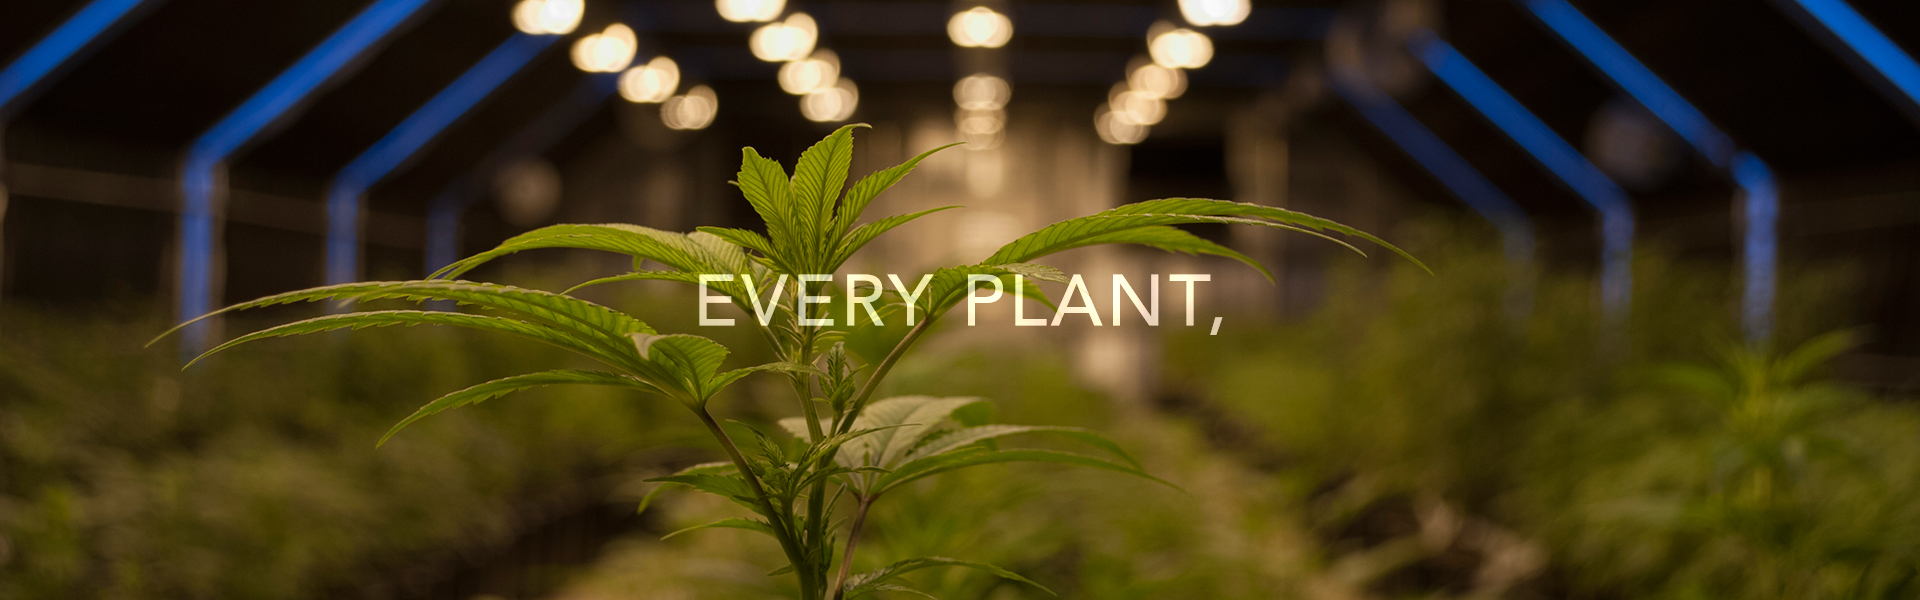 Every Plant.jpg